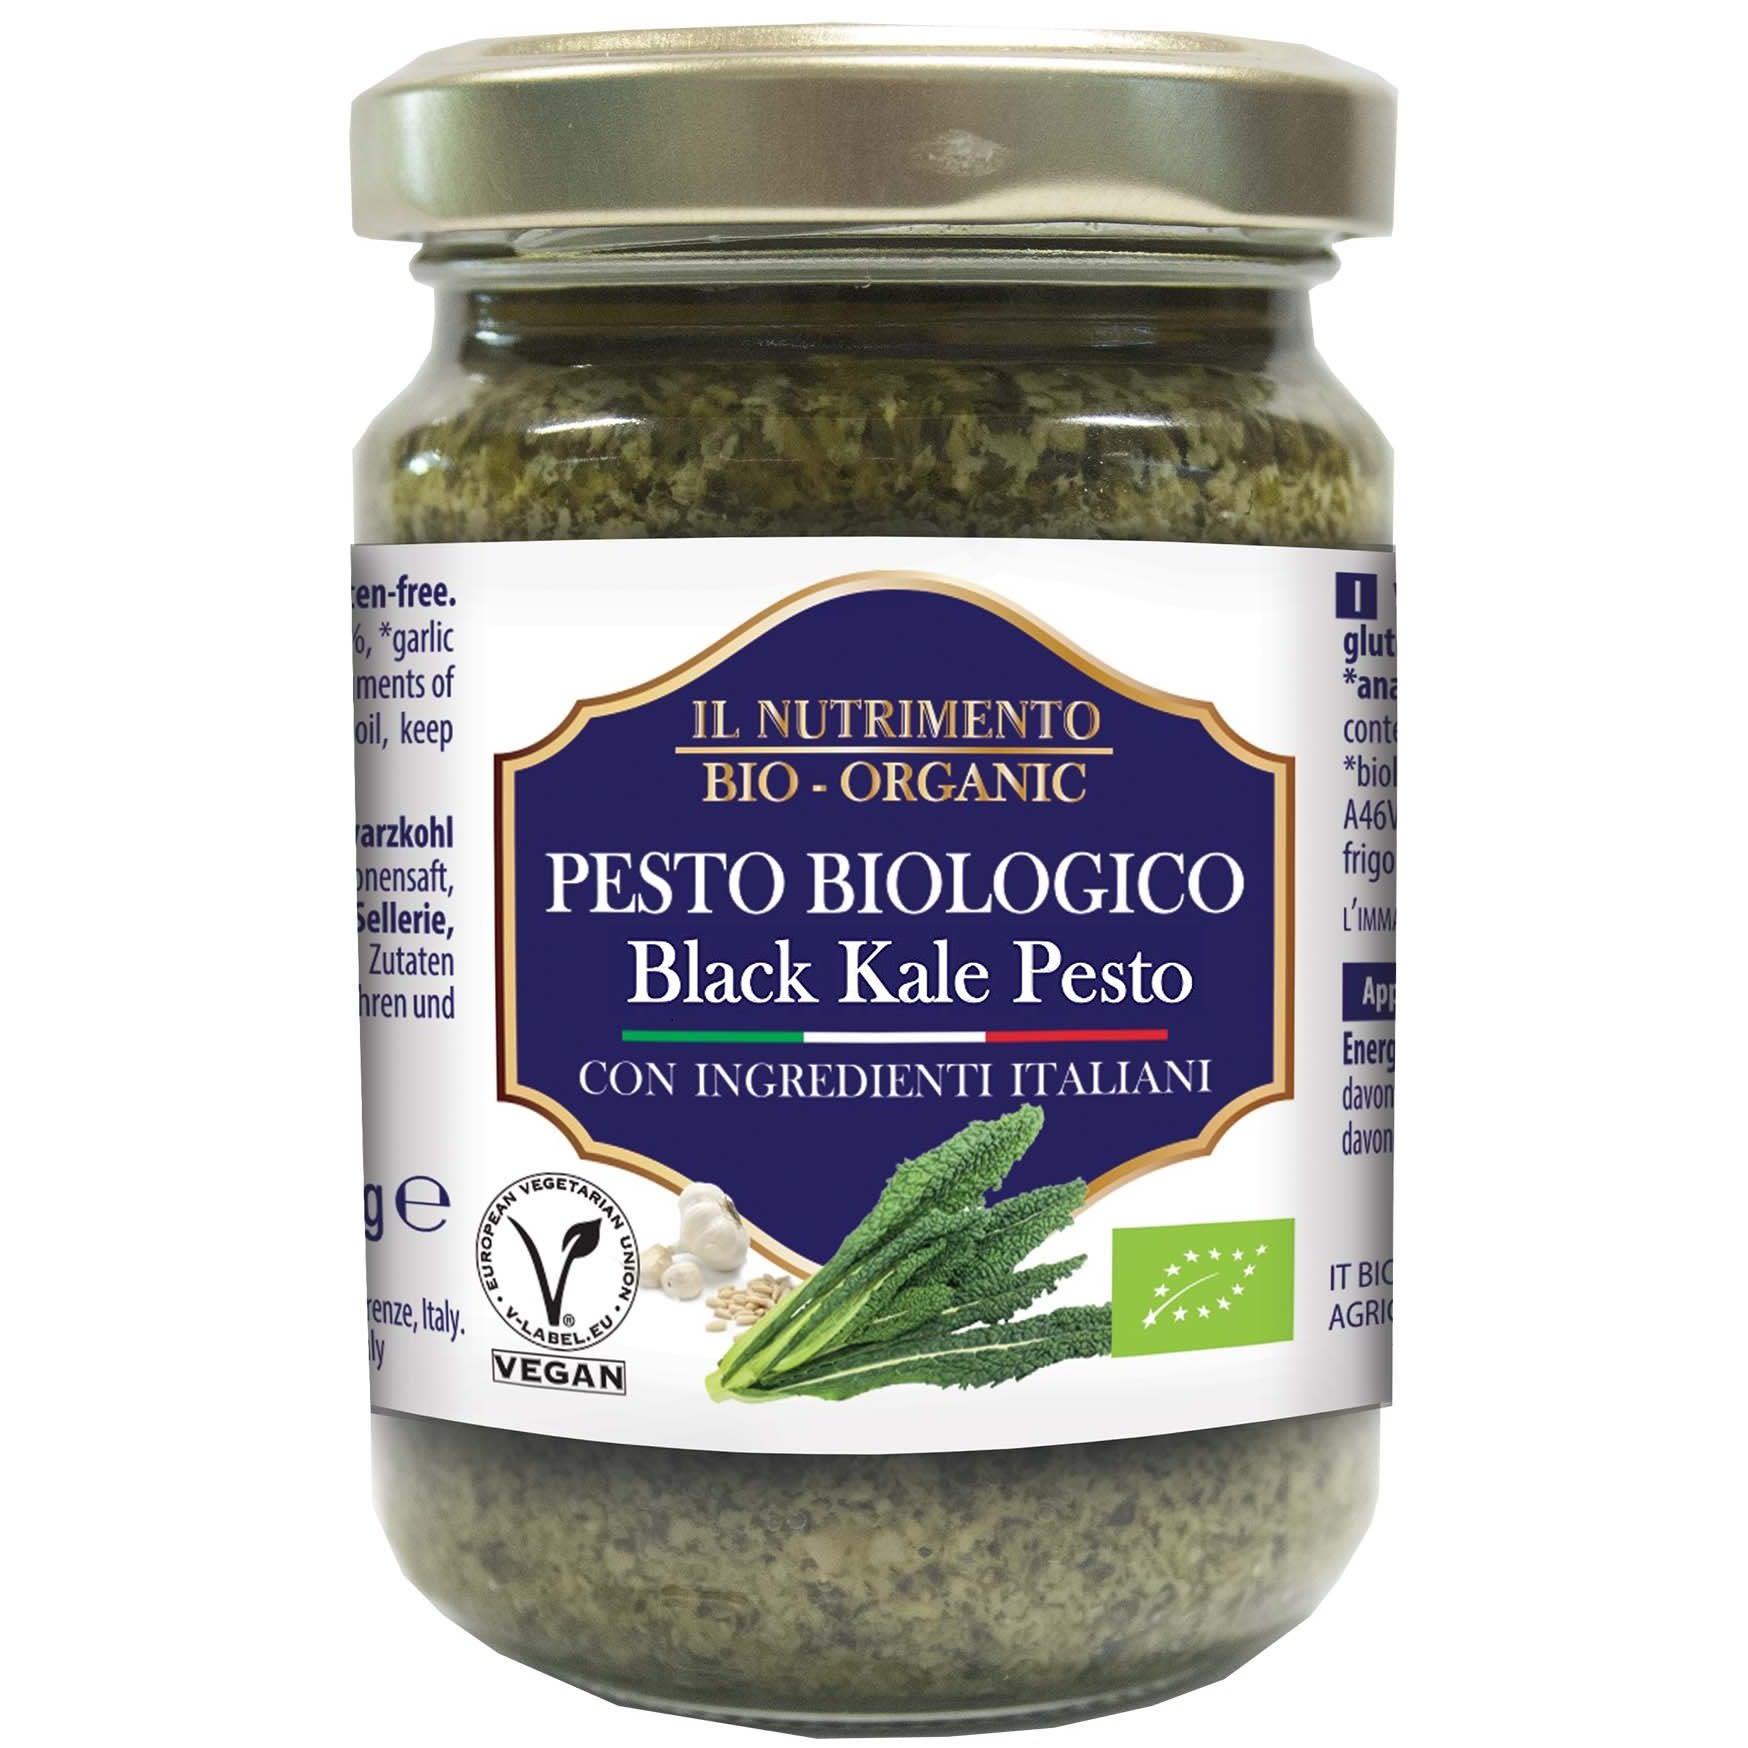 Pesto de Kale Negro y Piñones, Il Nutrimento